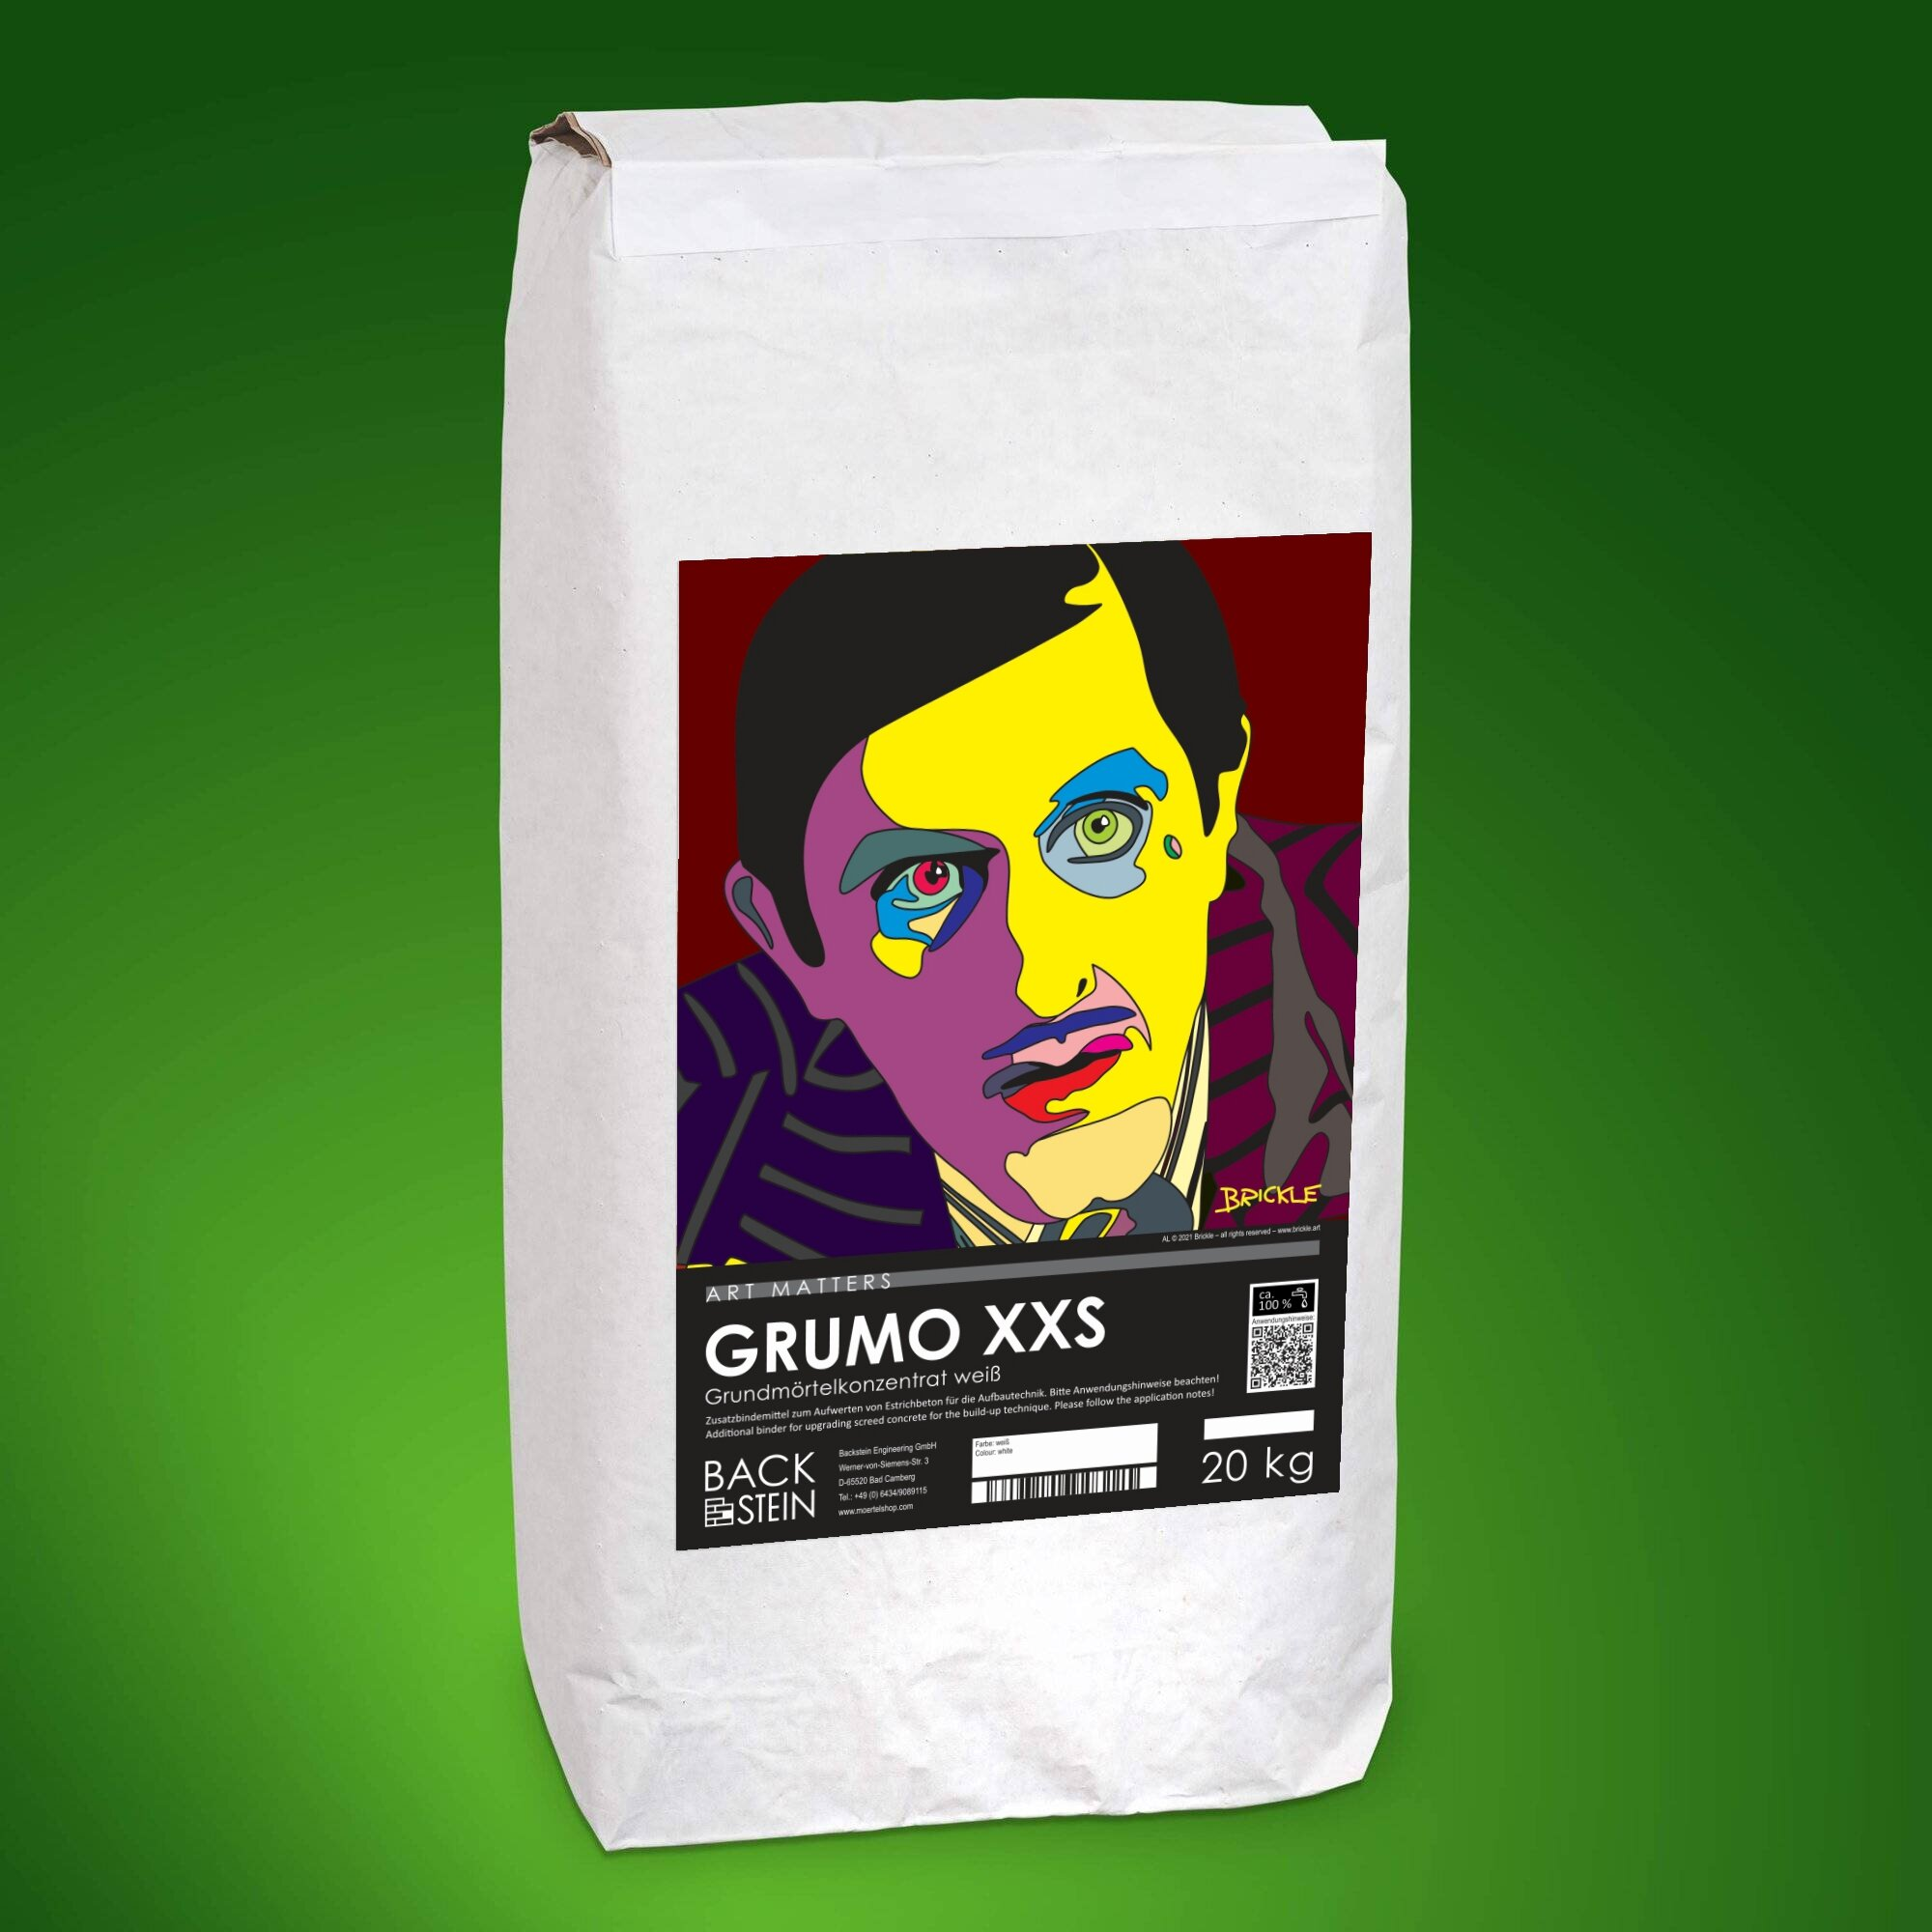 grumo xxs grundm rtelkonzentrat 20 kg m rtelshop 43 80. Black Bedroom Furniture Sets. Home Design Ideas